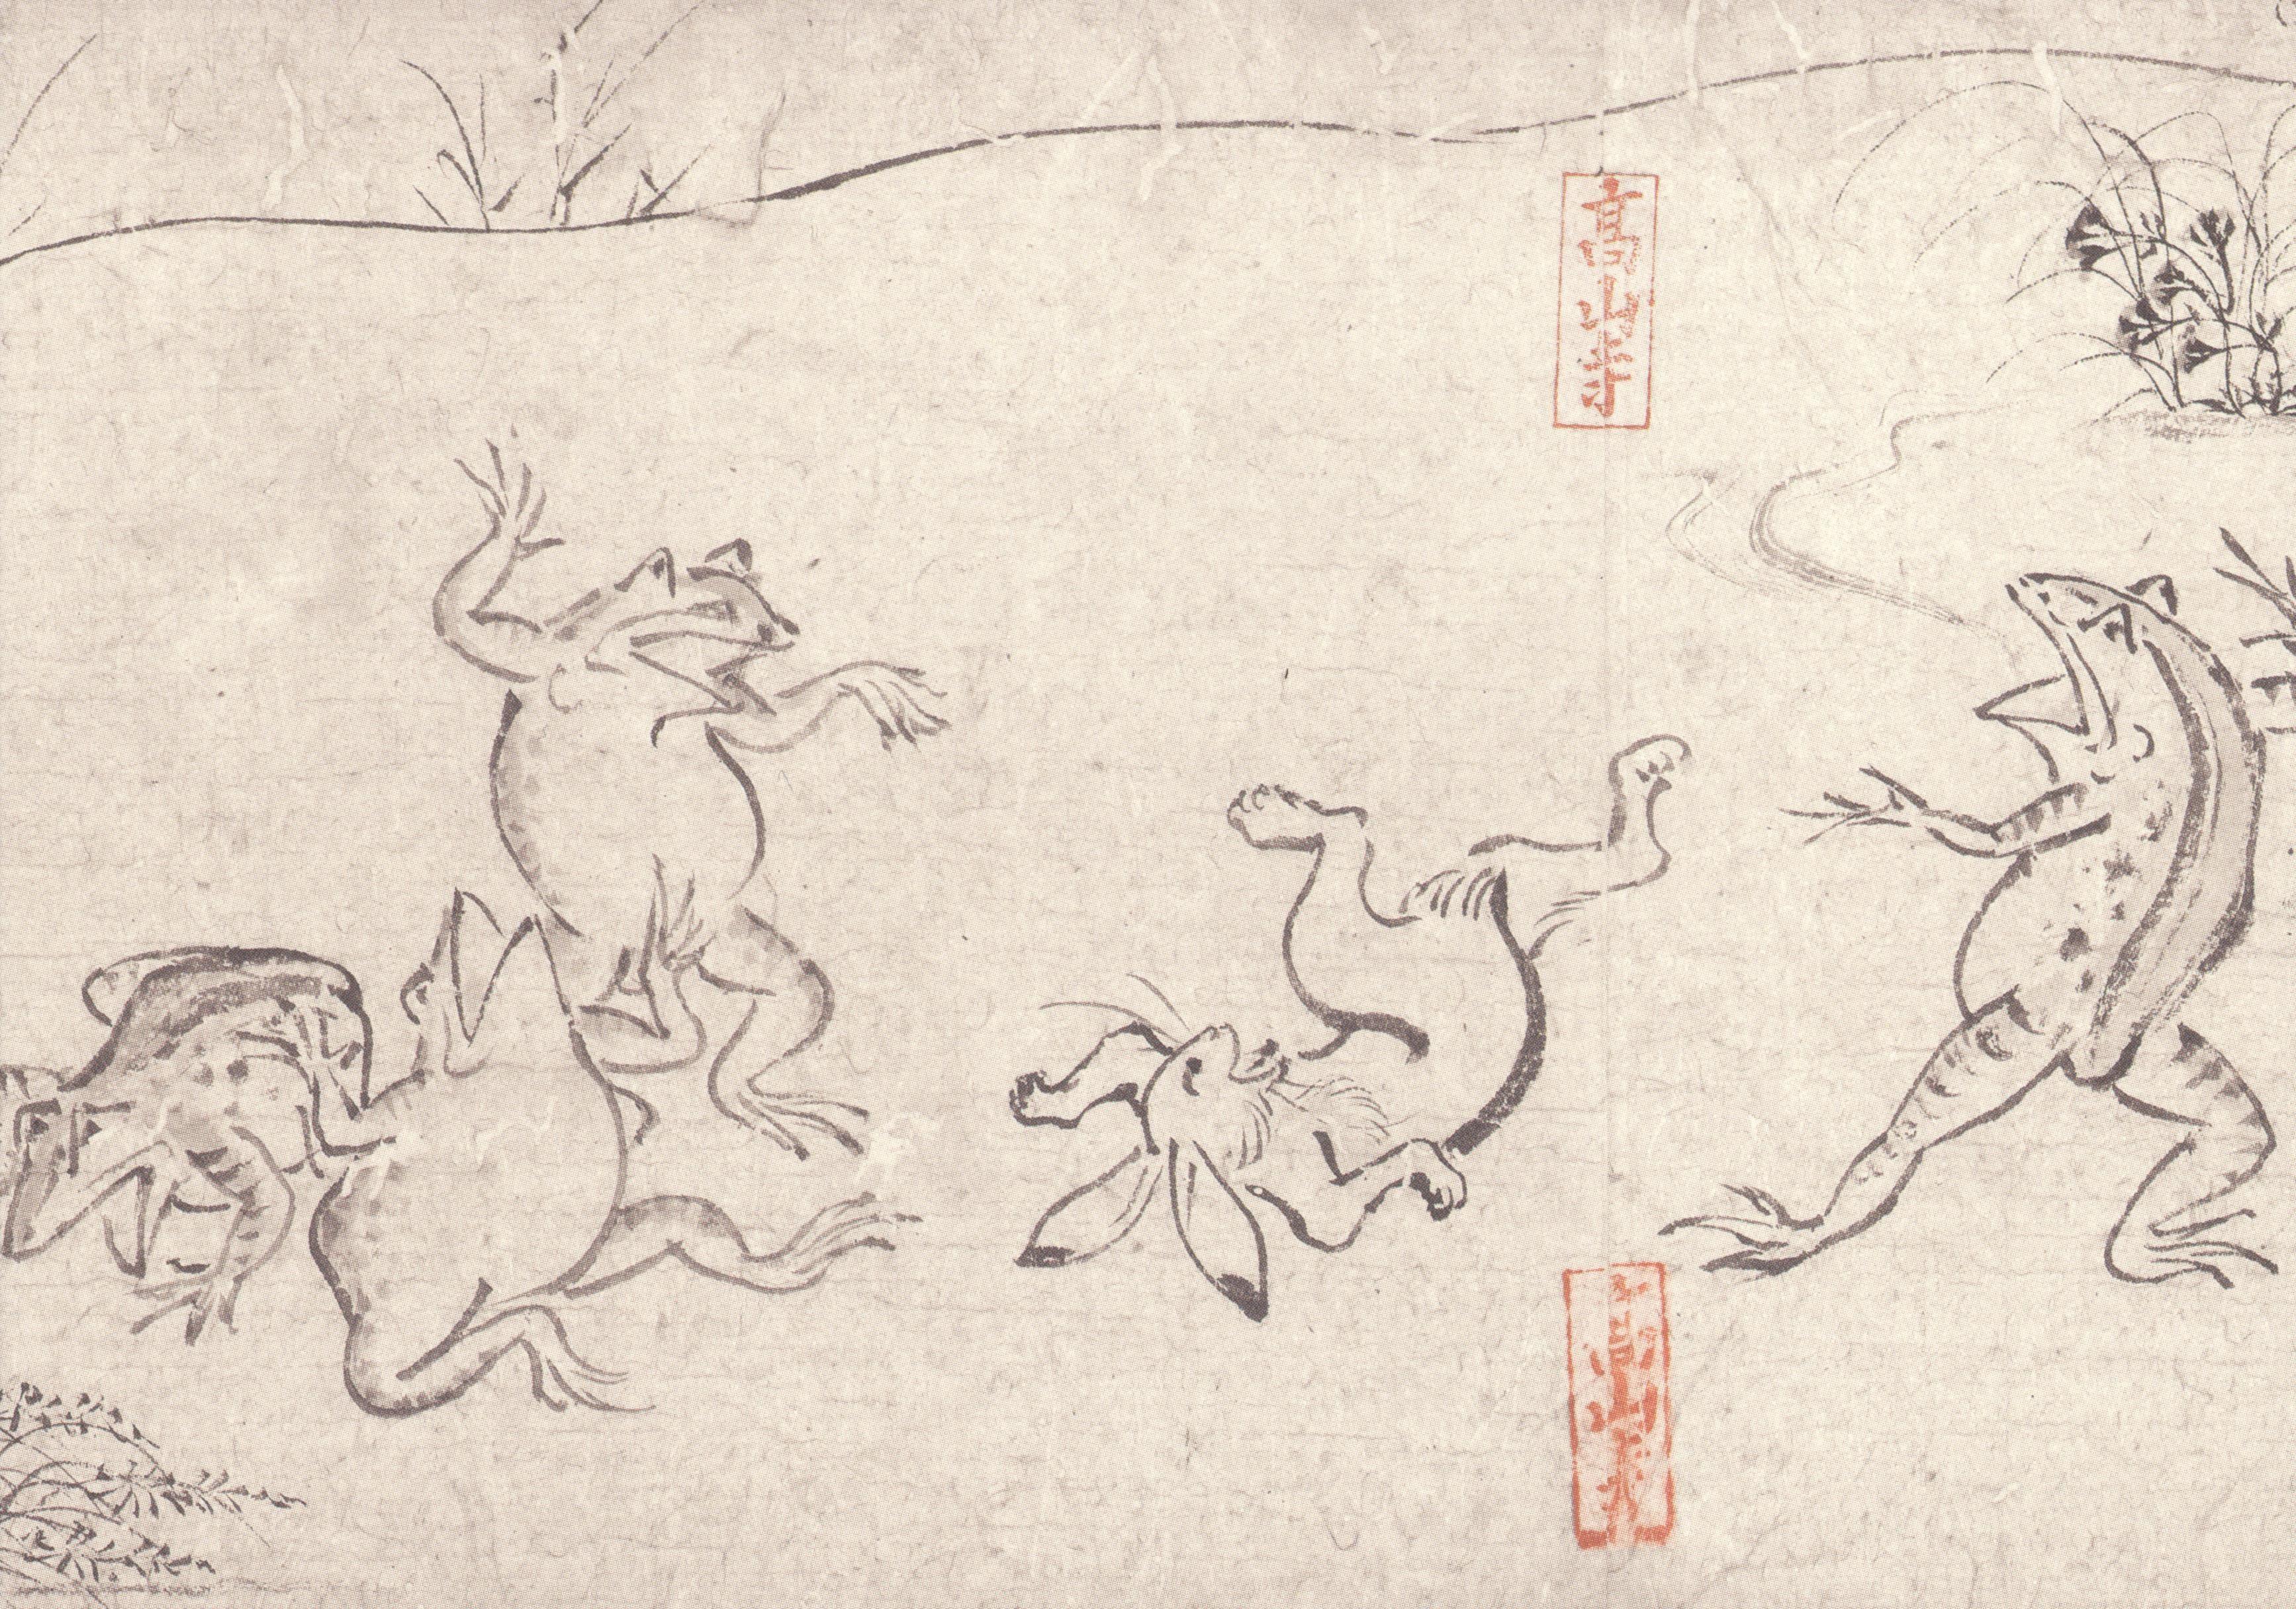 国宝 鳥獣人物戯画 甲巻 部分 平安時代 十二世紀 高山寺 鳥獣戯画 アートのアイデア 戯画